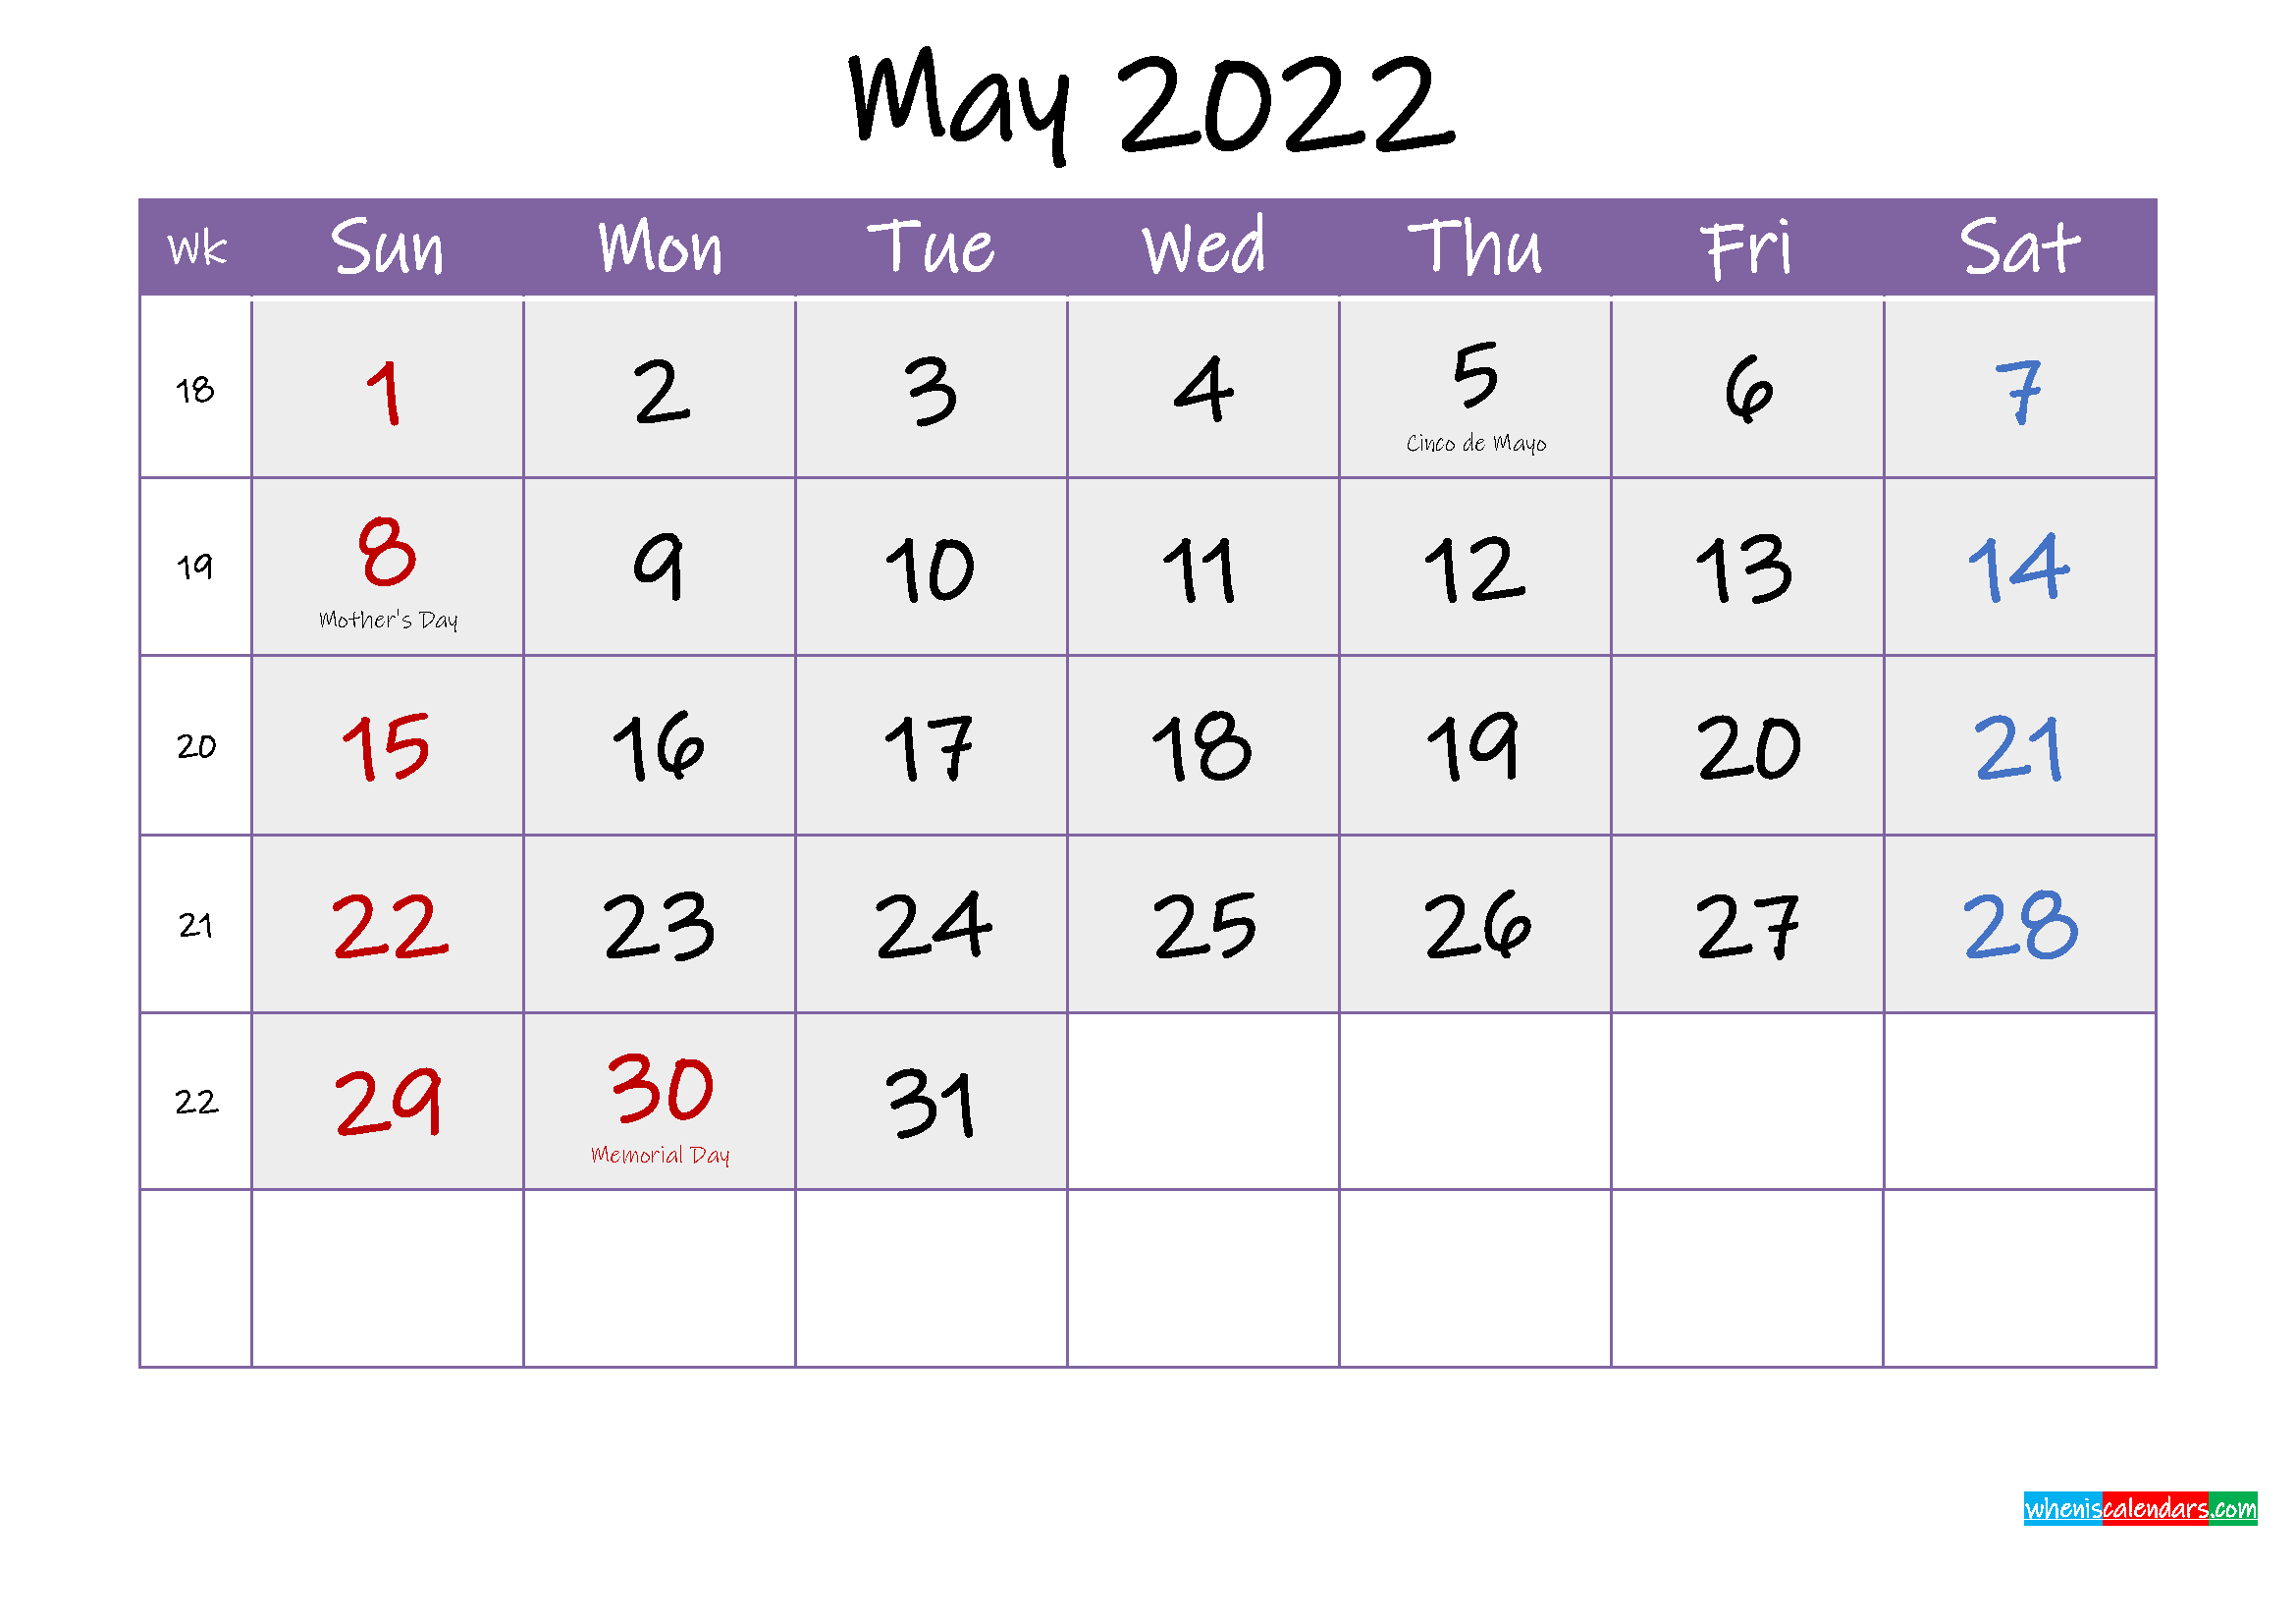 Free May 2022 Printable Calendar With Holidays - Template inside Printable Calendar May 2022